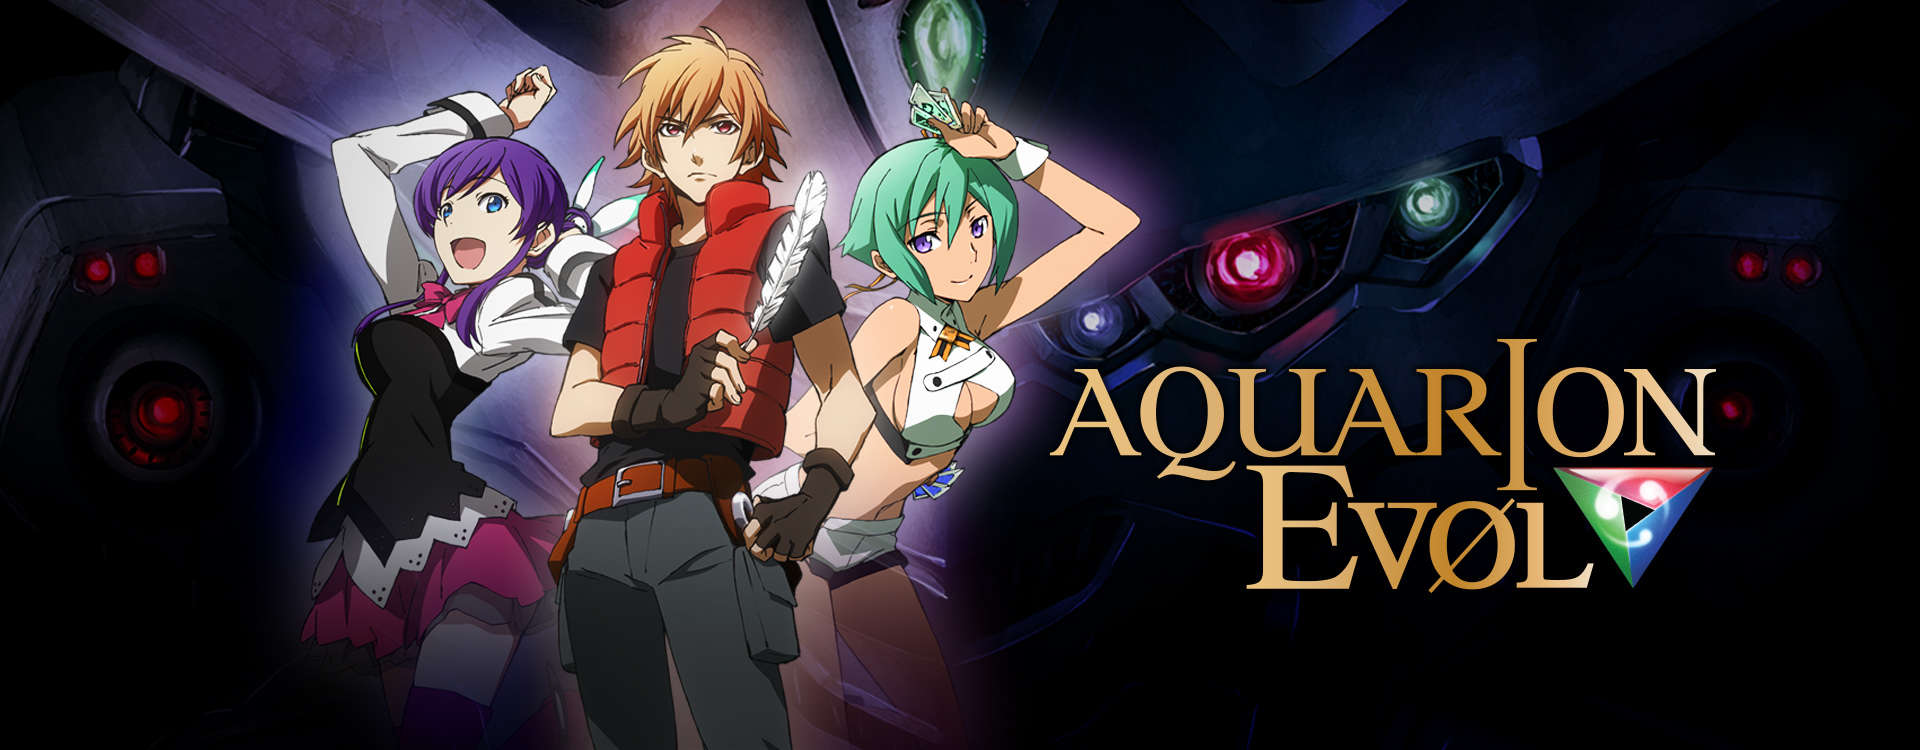 Aquarion Evol Serien Stream